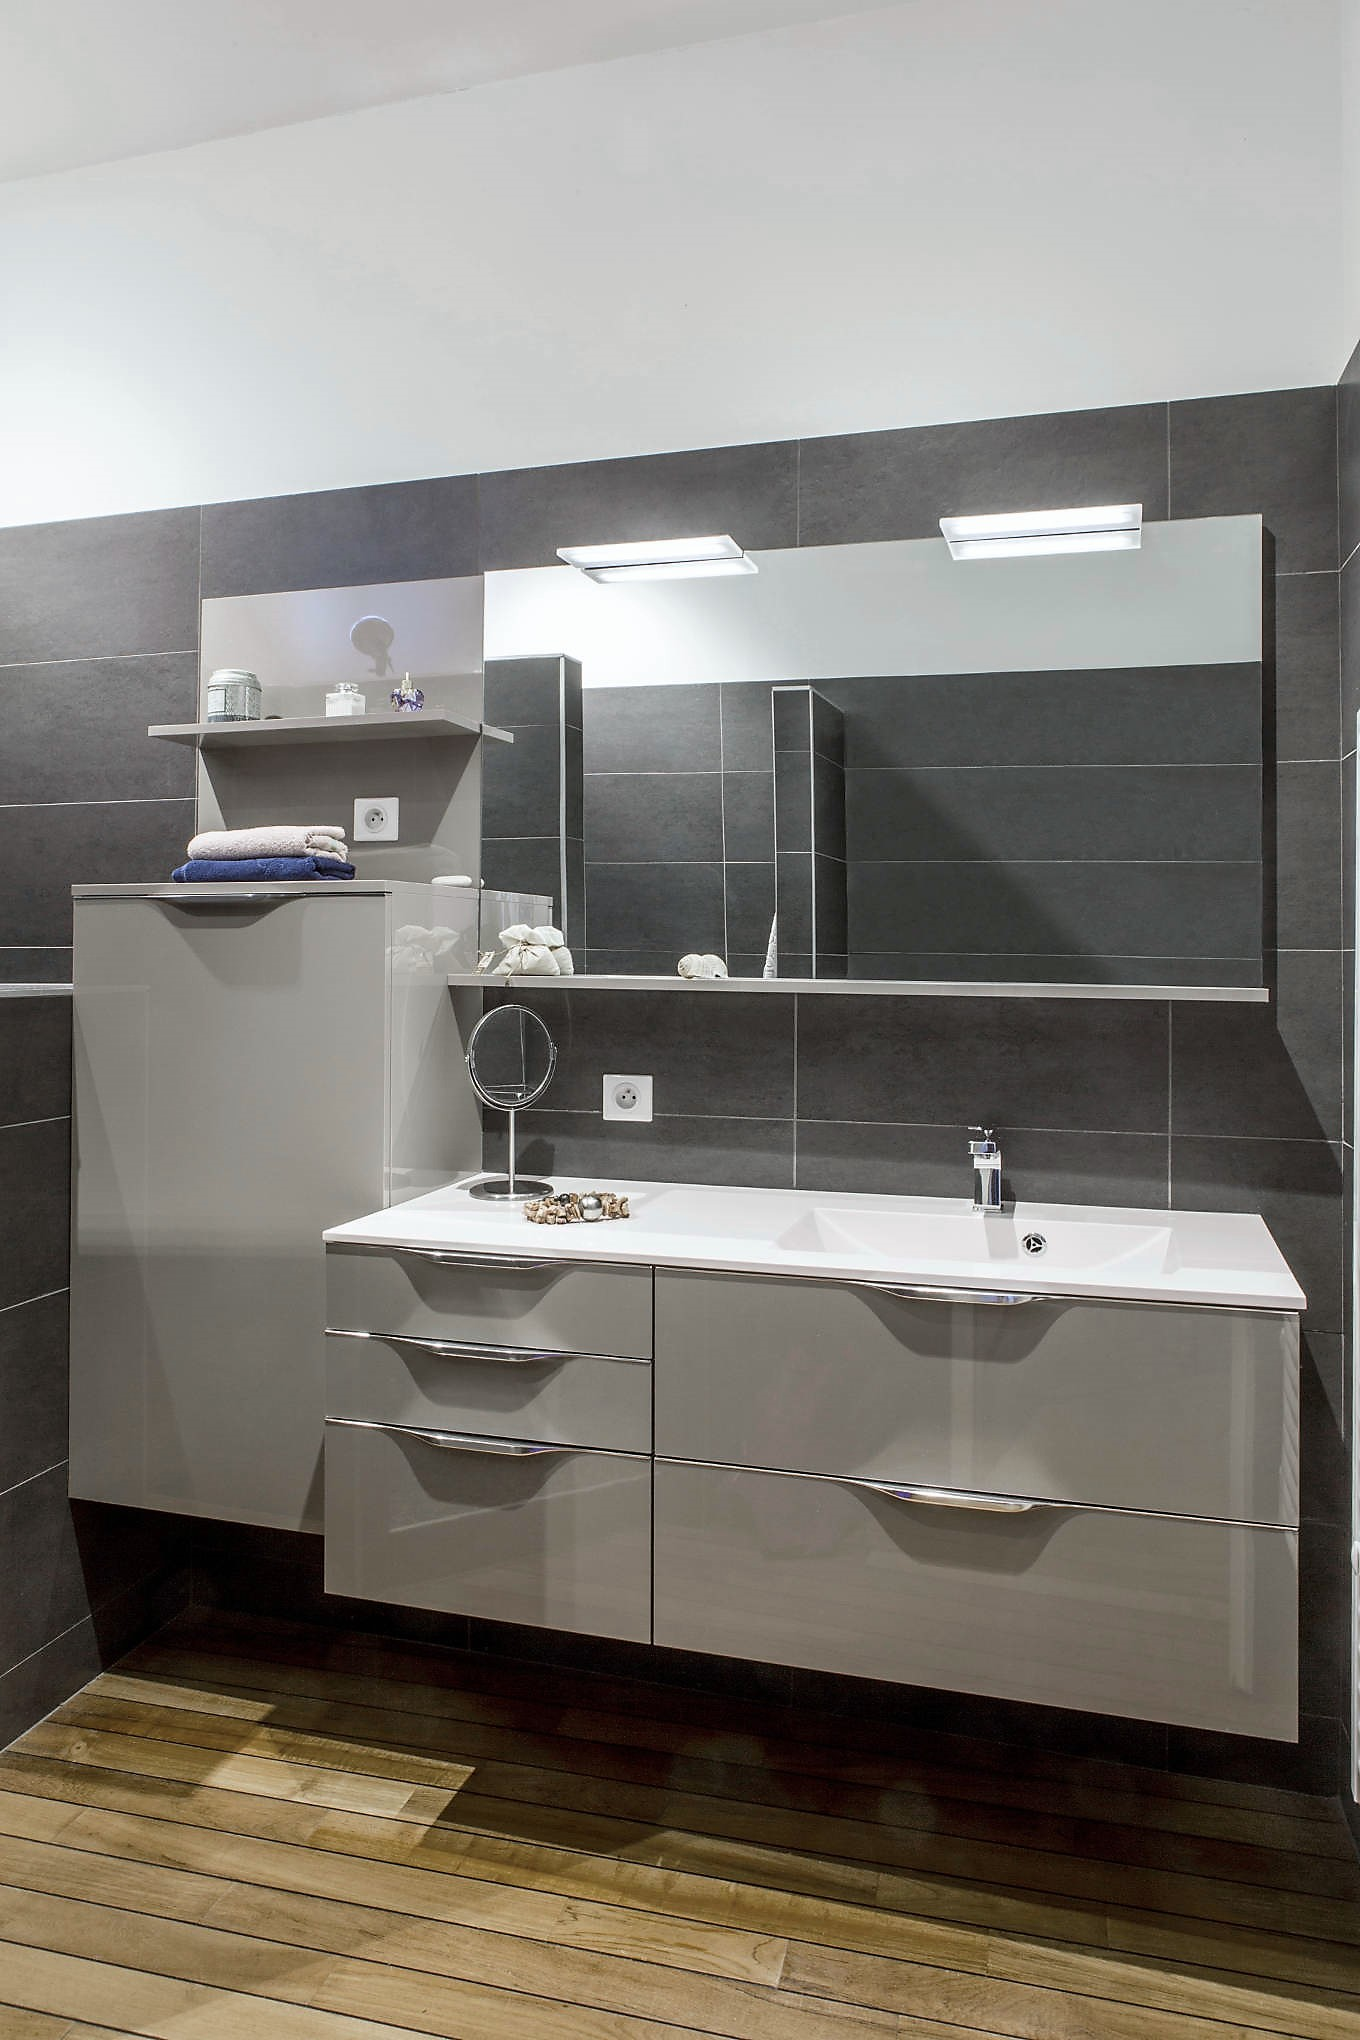 Salle de bains FUTURA MÉDIUM VERNIS BRILLANT GRIS TAUPE MÉTALLISÉ